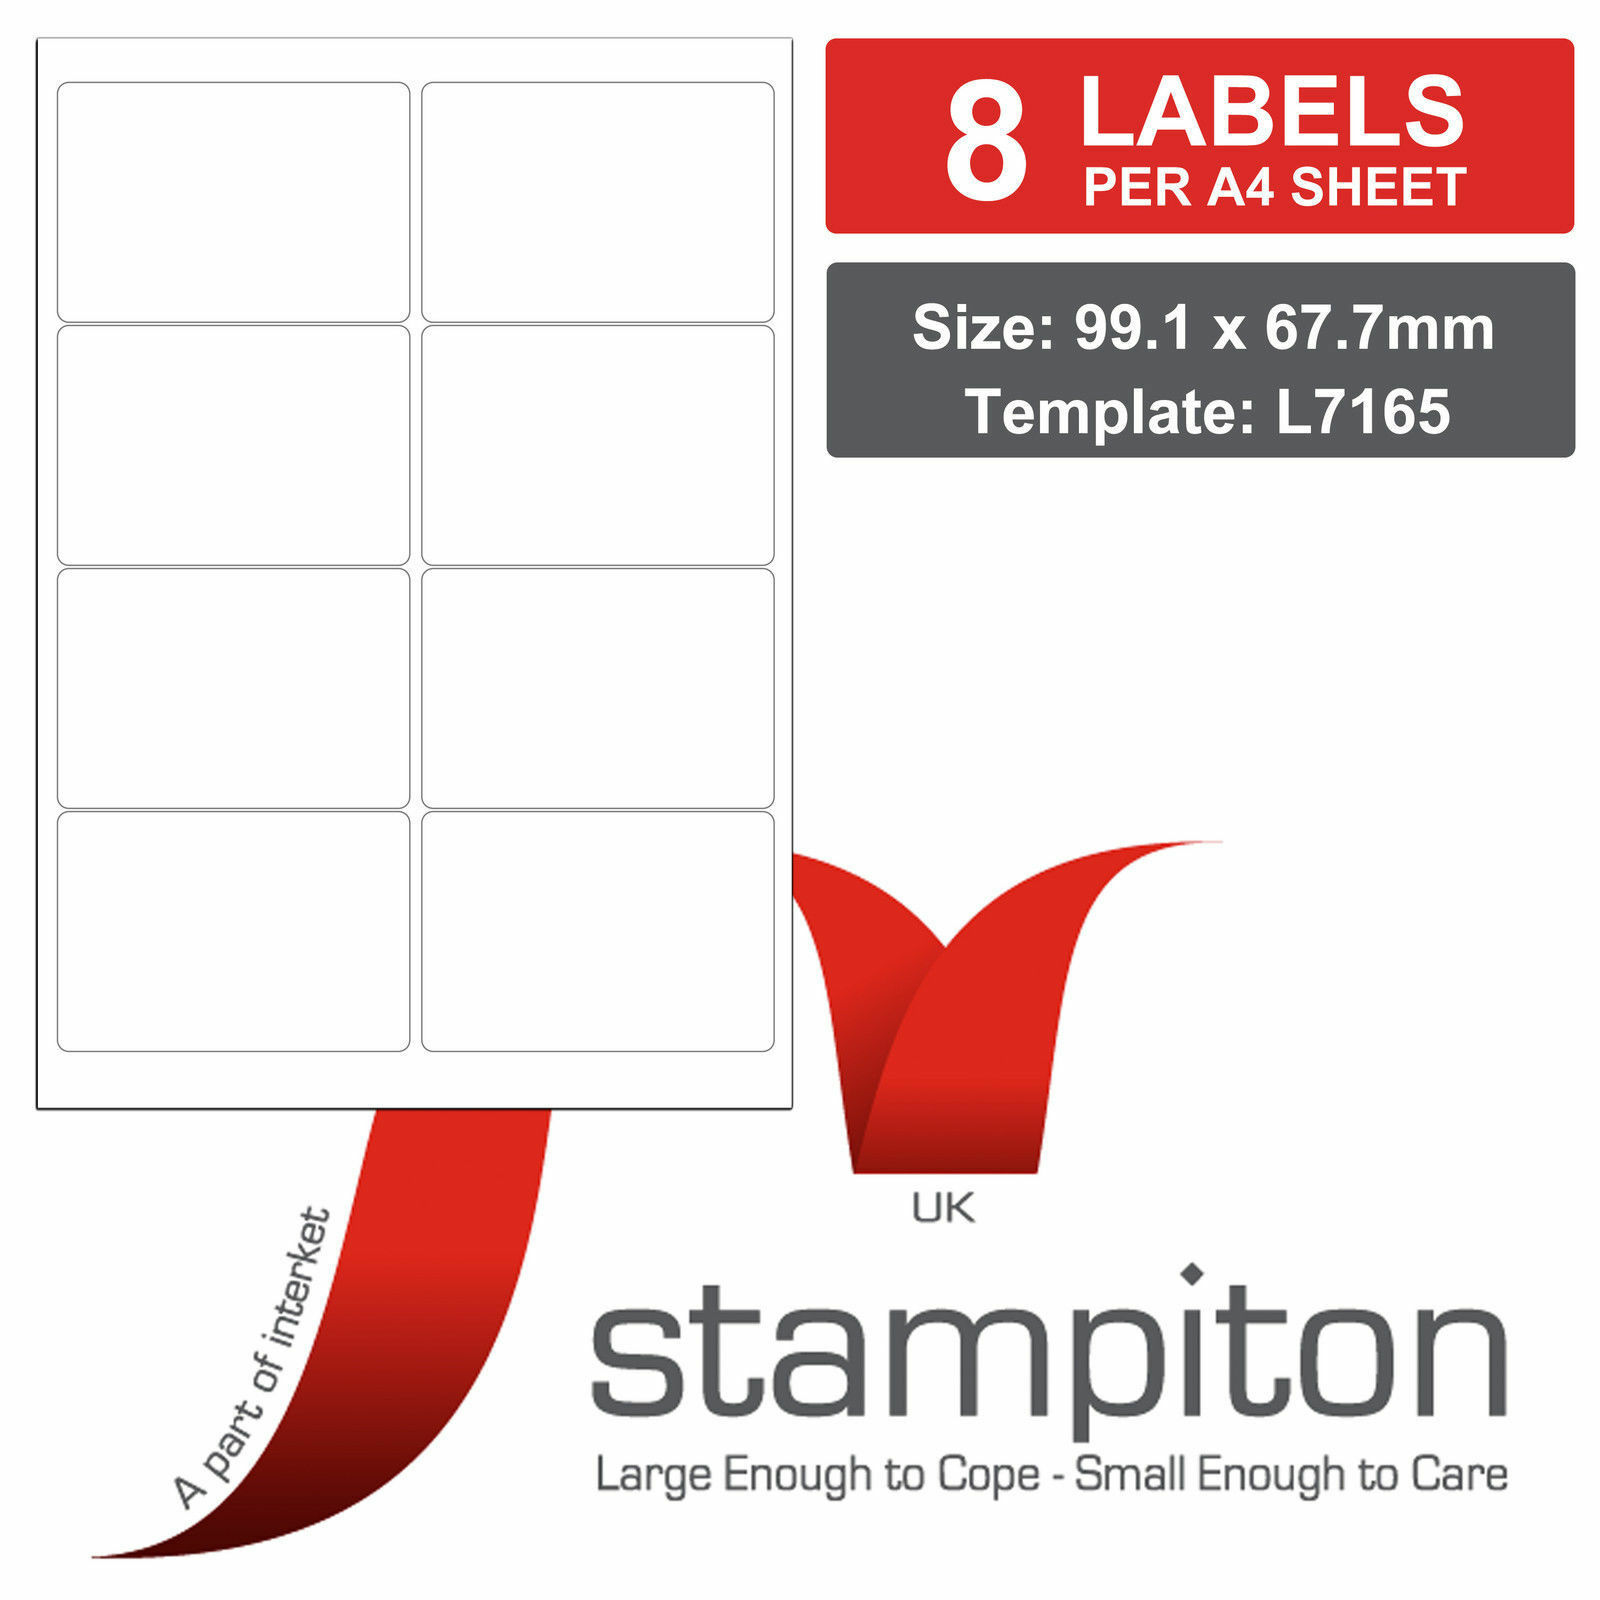 pk 100 stampiton 8 per sheet multipurpose label avery l7165 j7165